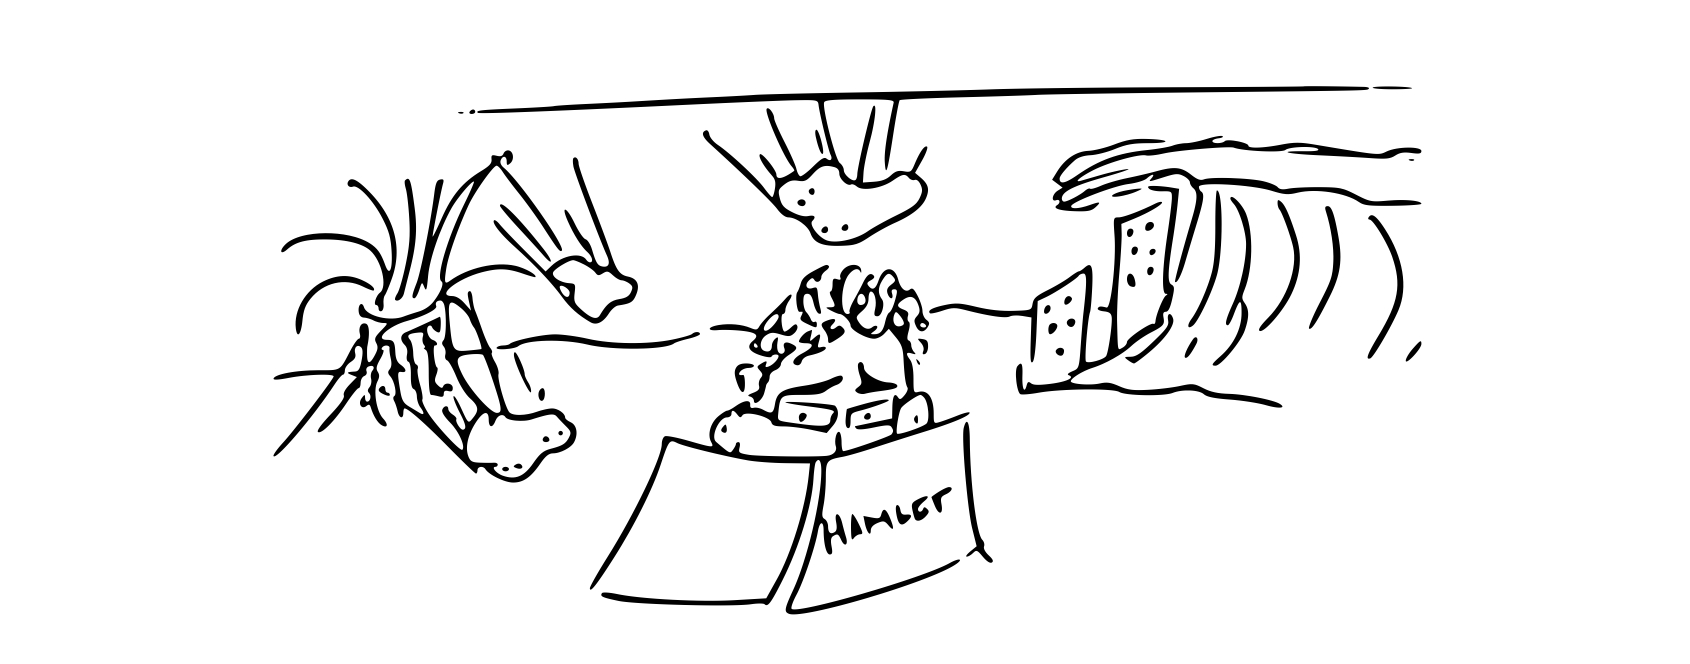 Jons Hamlet Apocalypse